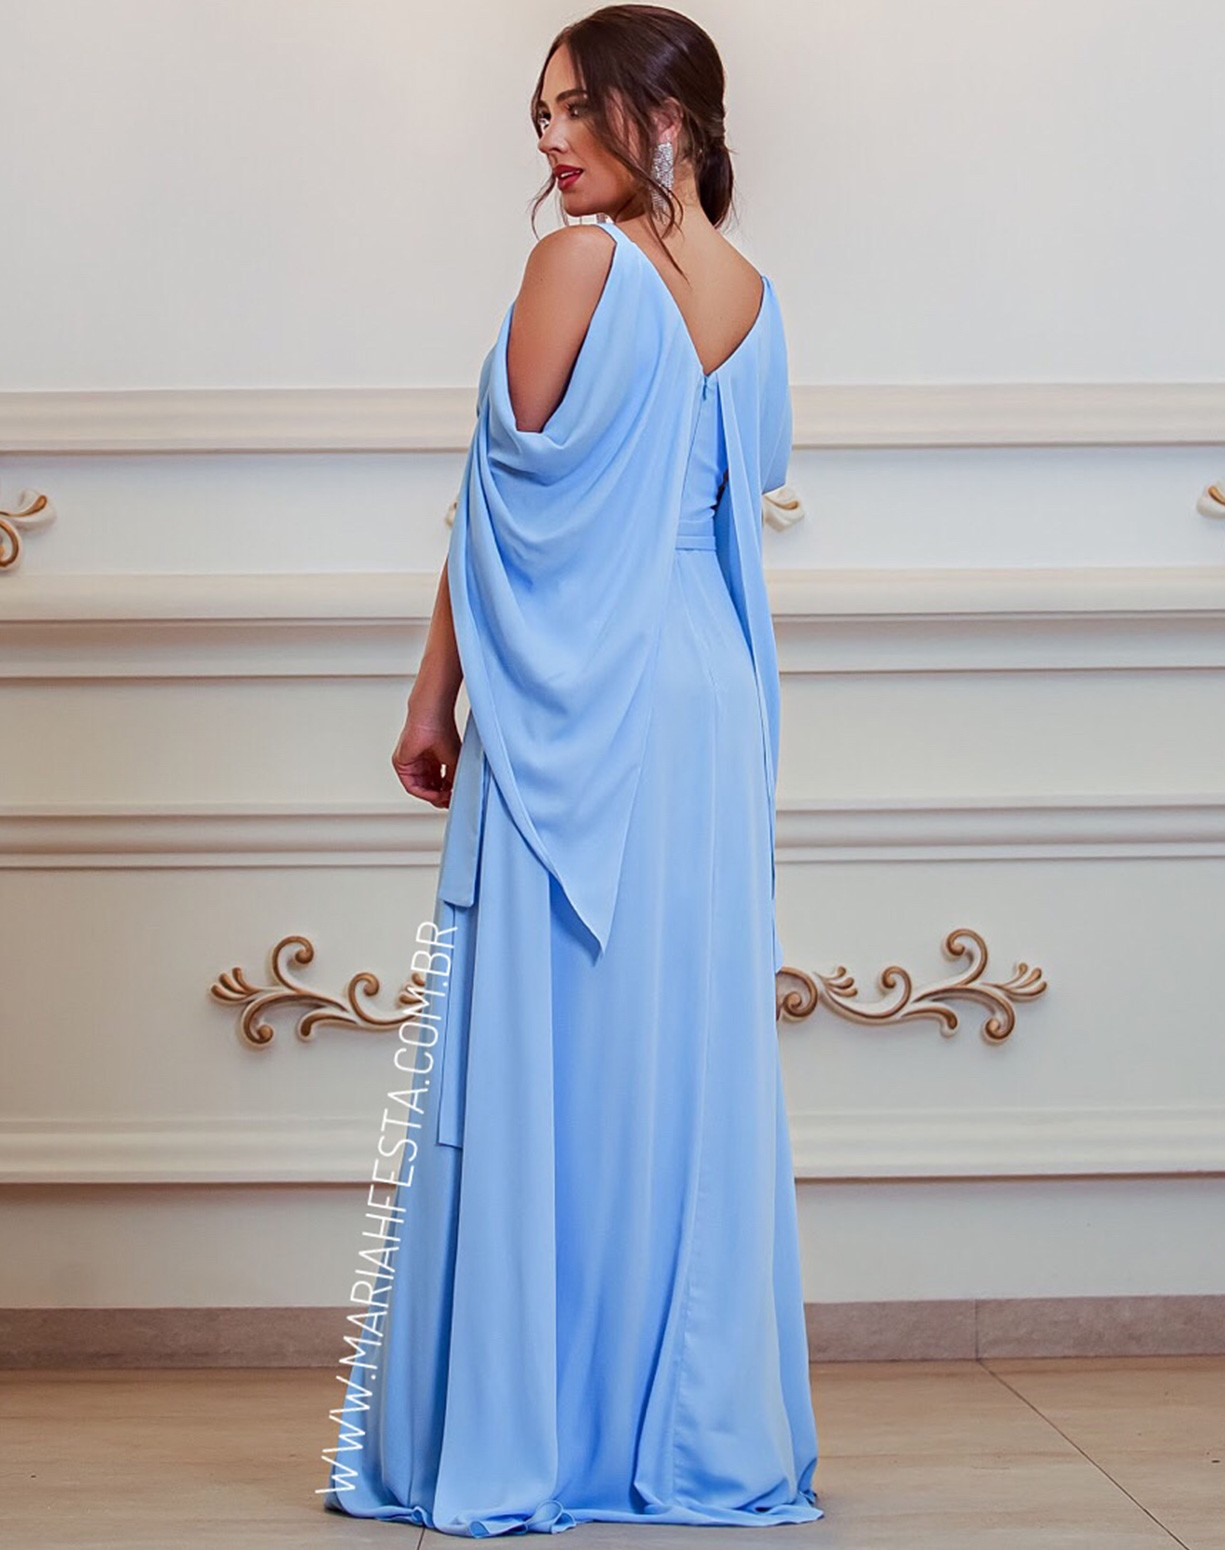 Vestido Azul Serenity Manga Capa Voal